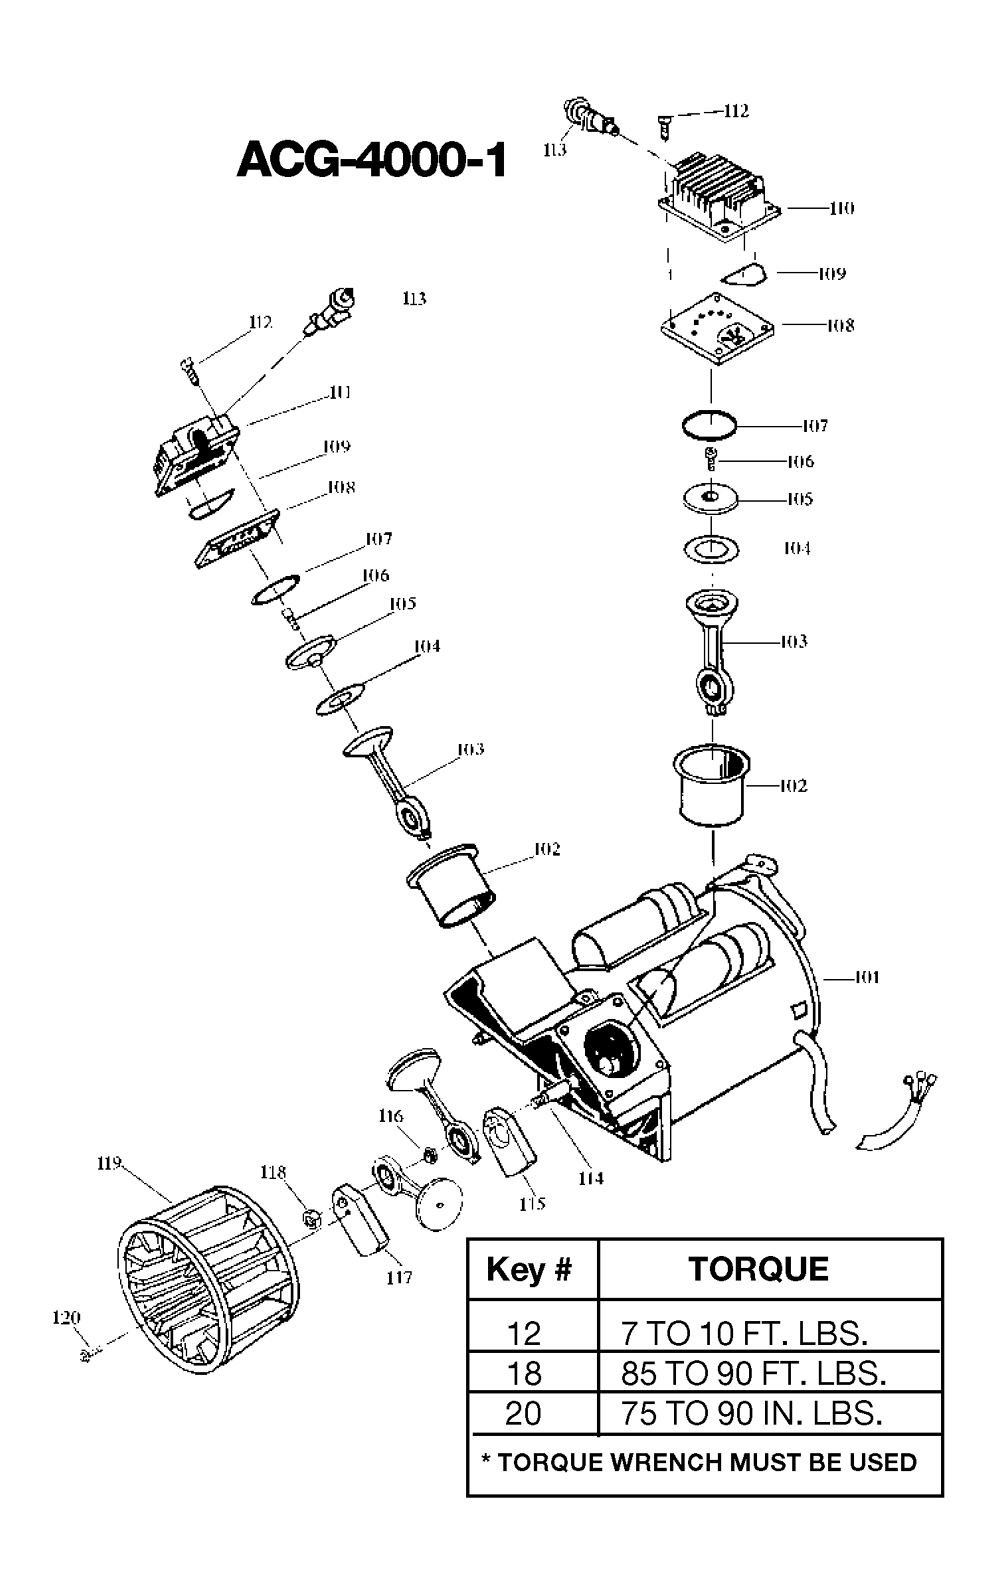 IR500TVE60V-Devilbiss-T0-PB-1Break Down